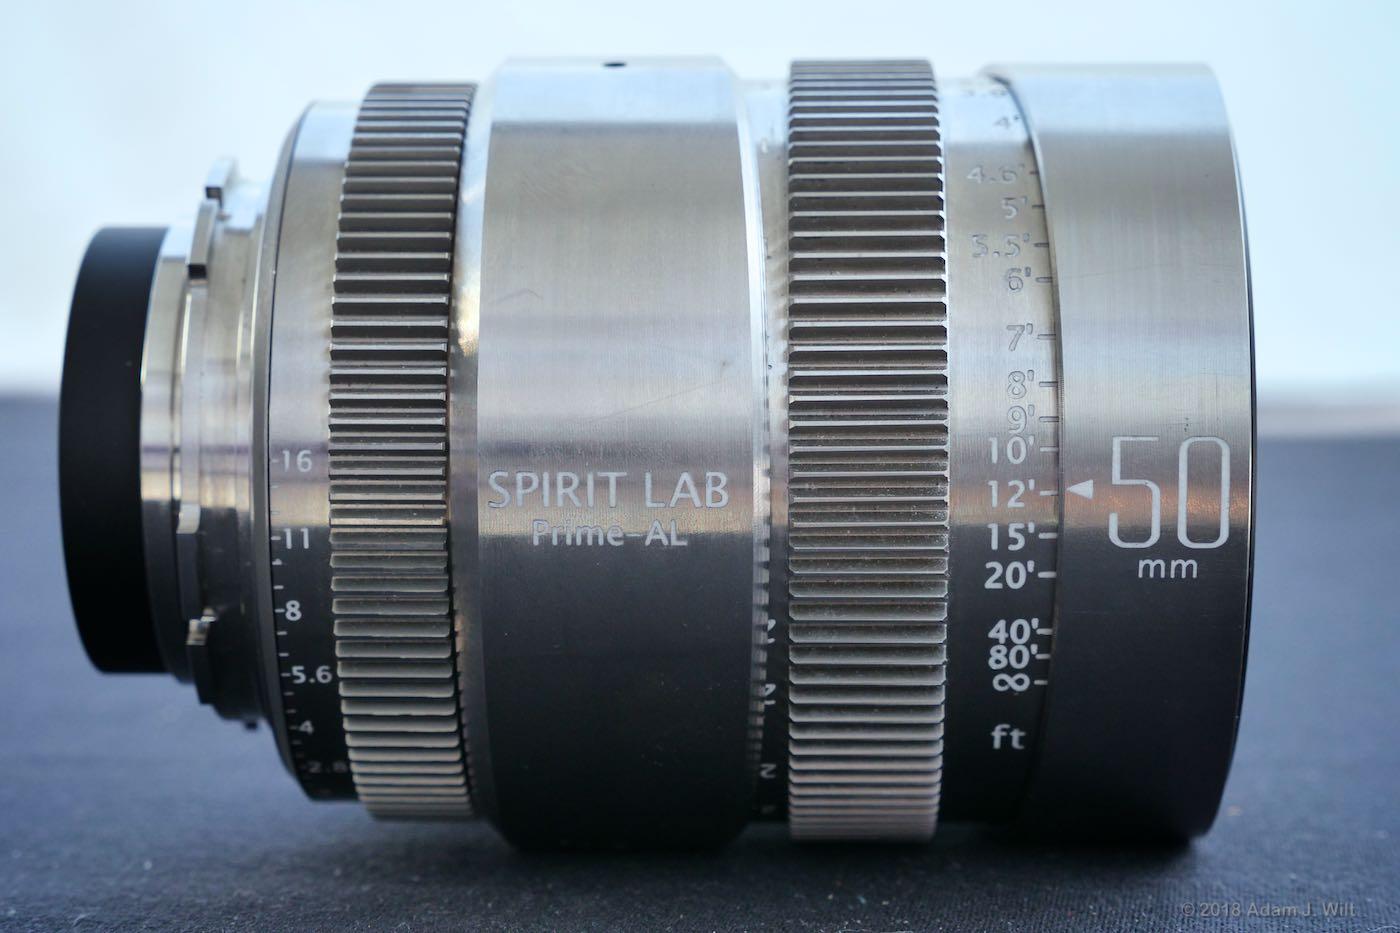 Spirit Lab 50mm